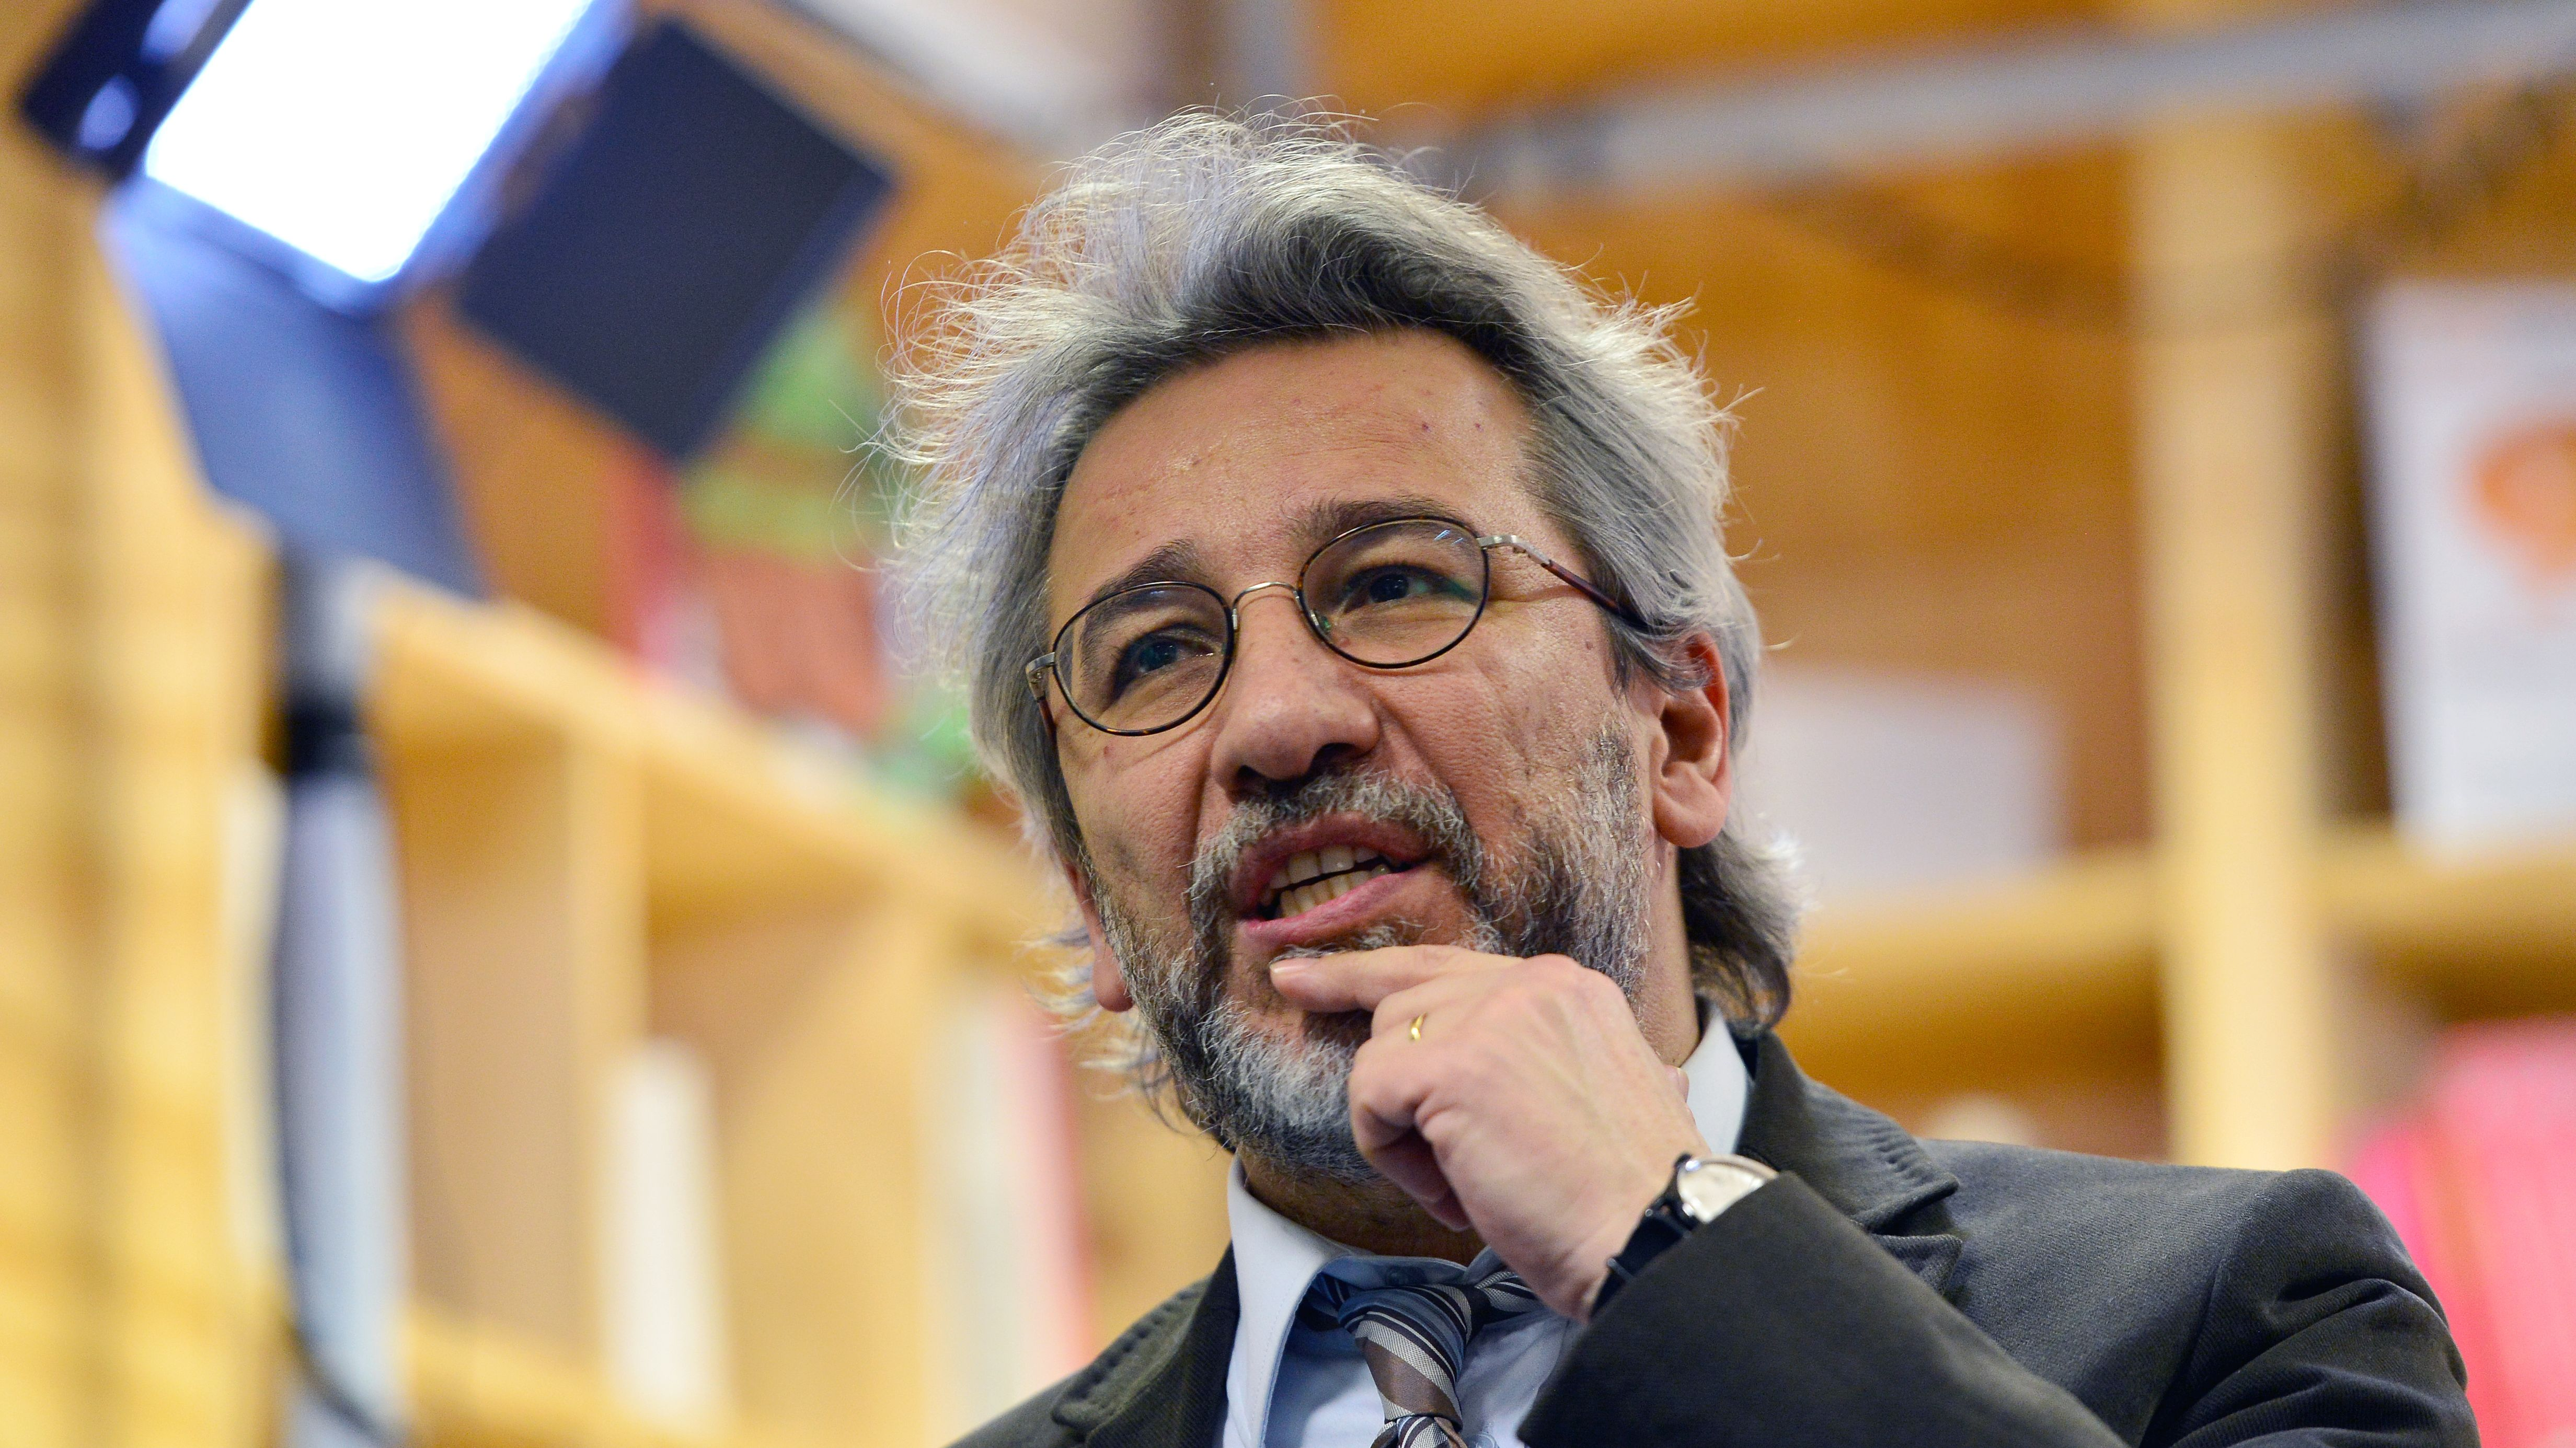 Der ehemalige Cumhuriyet-Chefredakteur Can Dündar